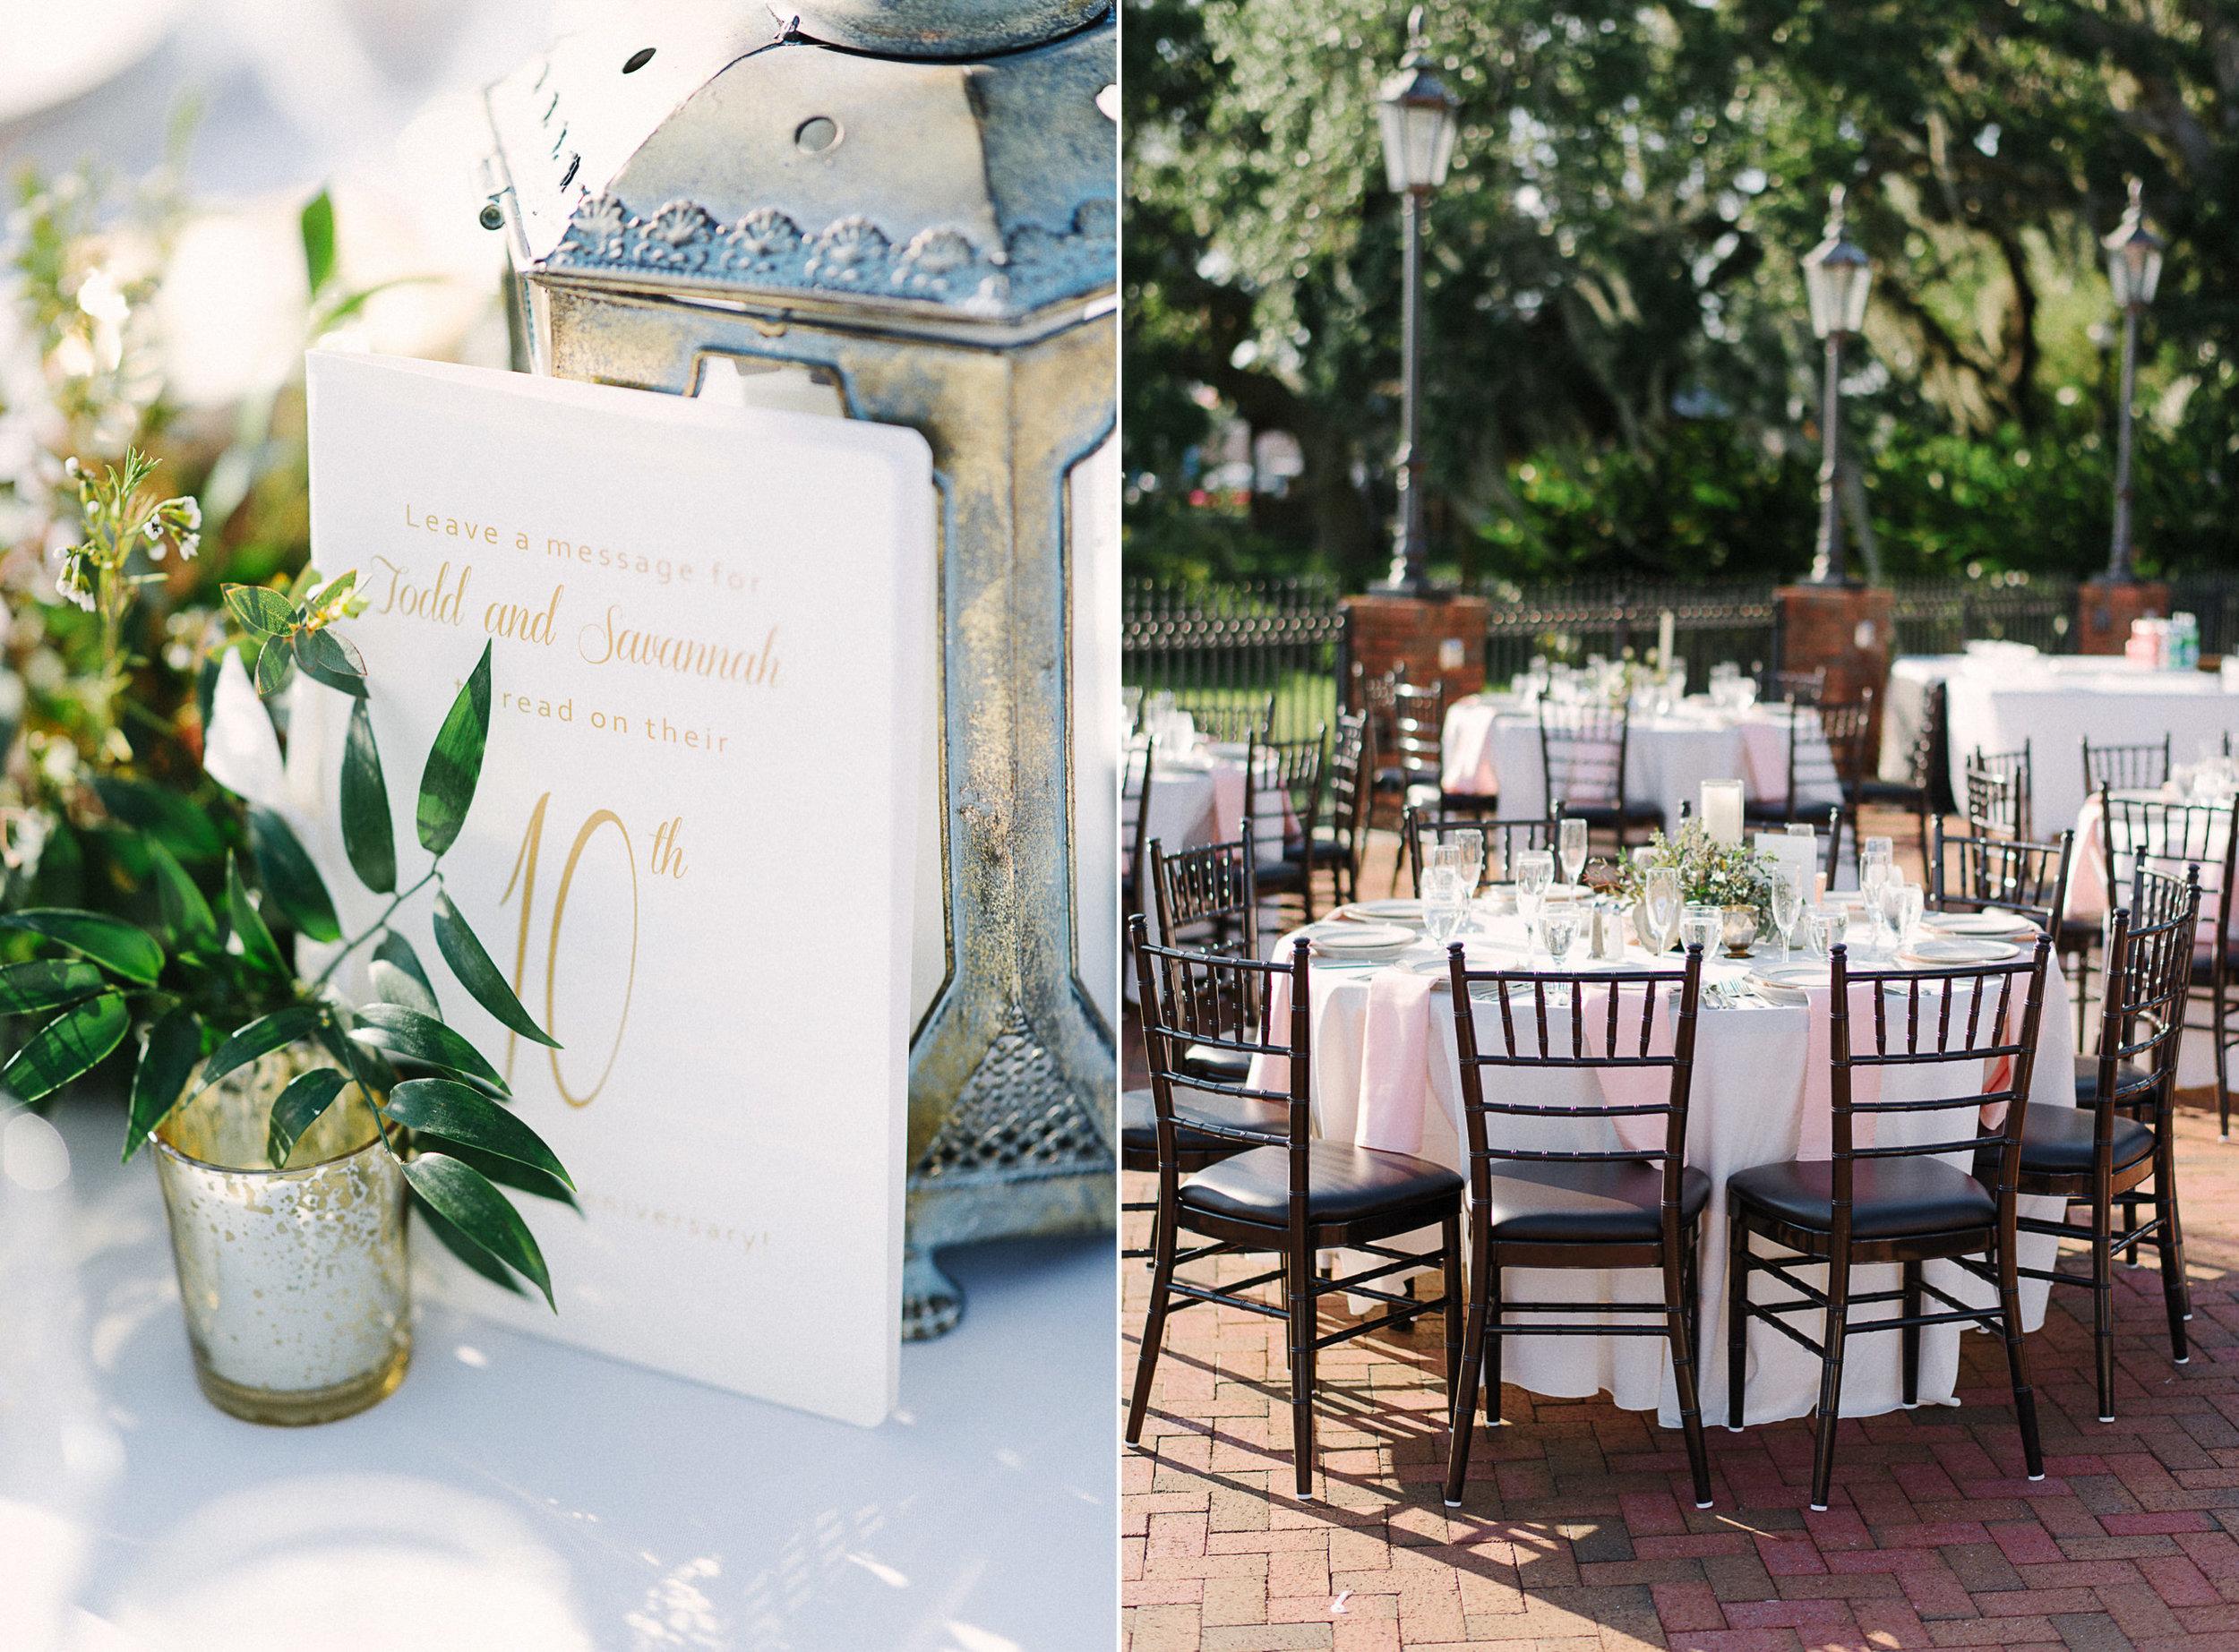 Tavares+Pavilion+on+the+Lake+Wedding+Florida_029.jpg